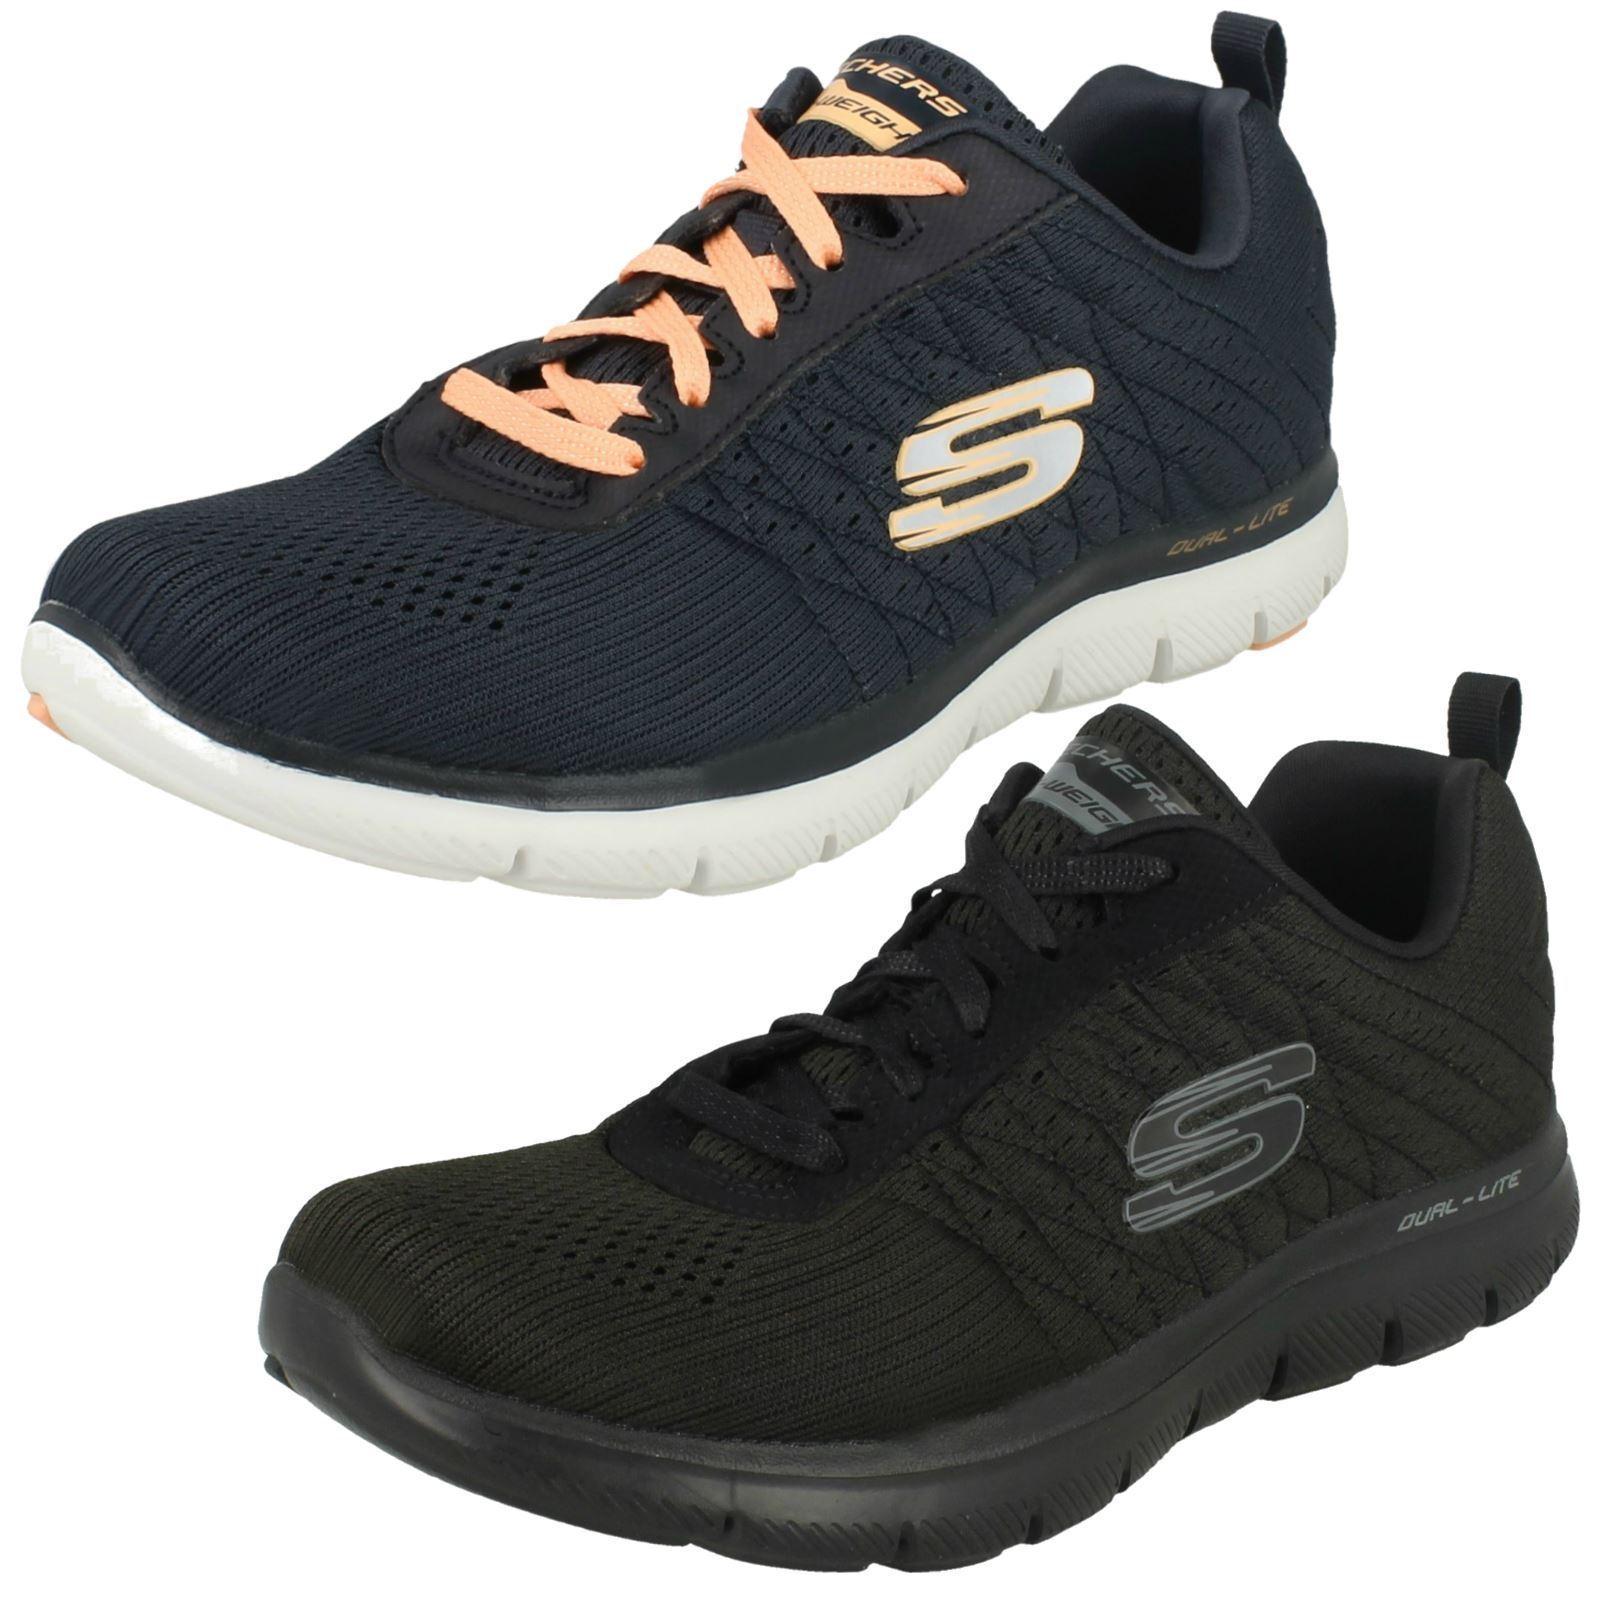 Zapatos promocionales para hombres y mujeres Ladies Skechers 12757 Flex Appeal 2.0 - Break Free Lace Up Trainers